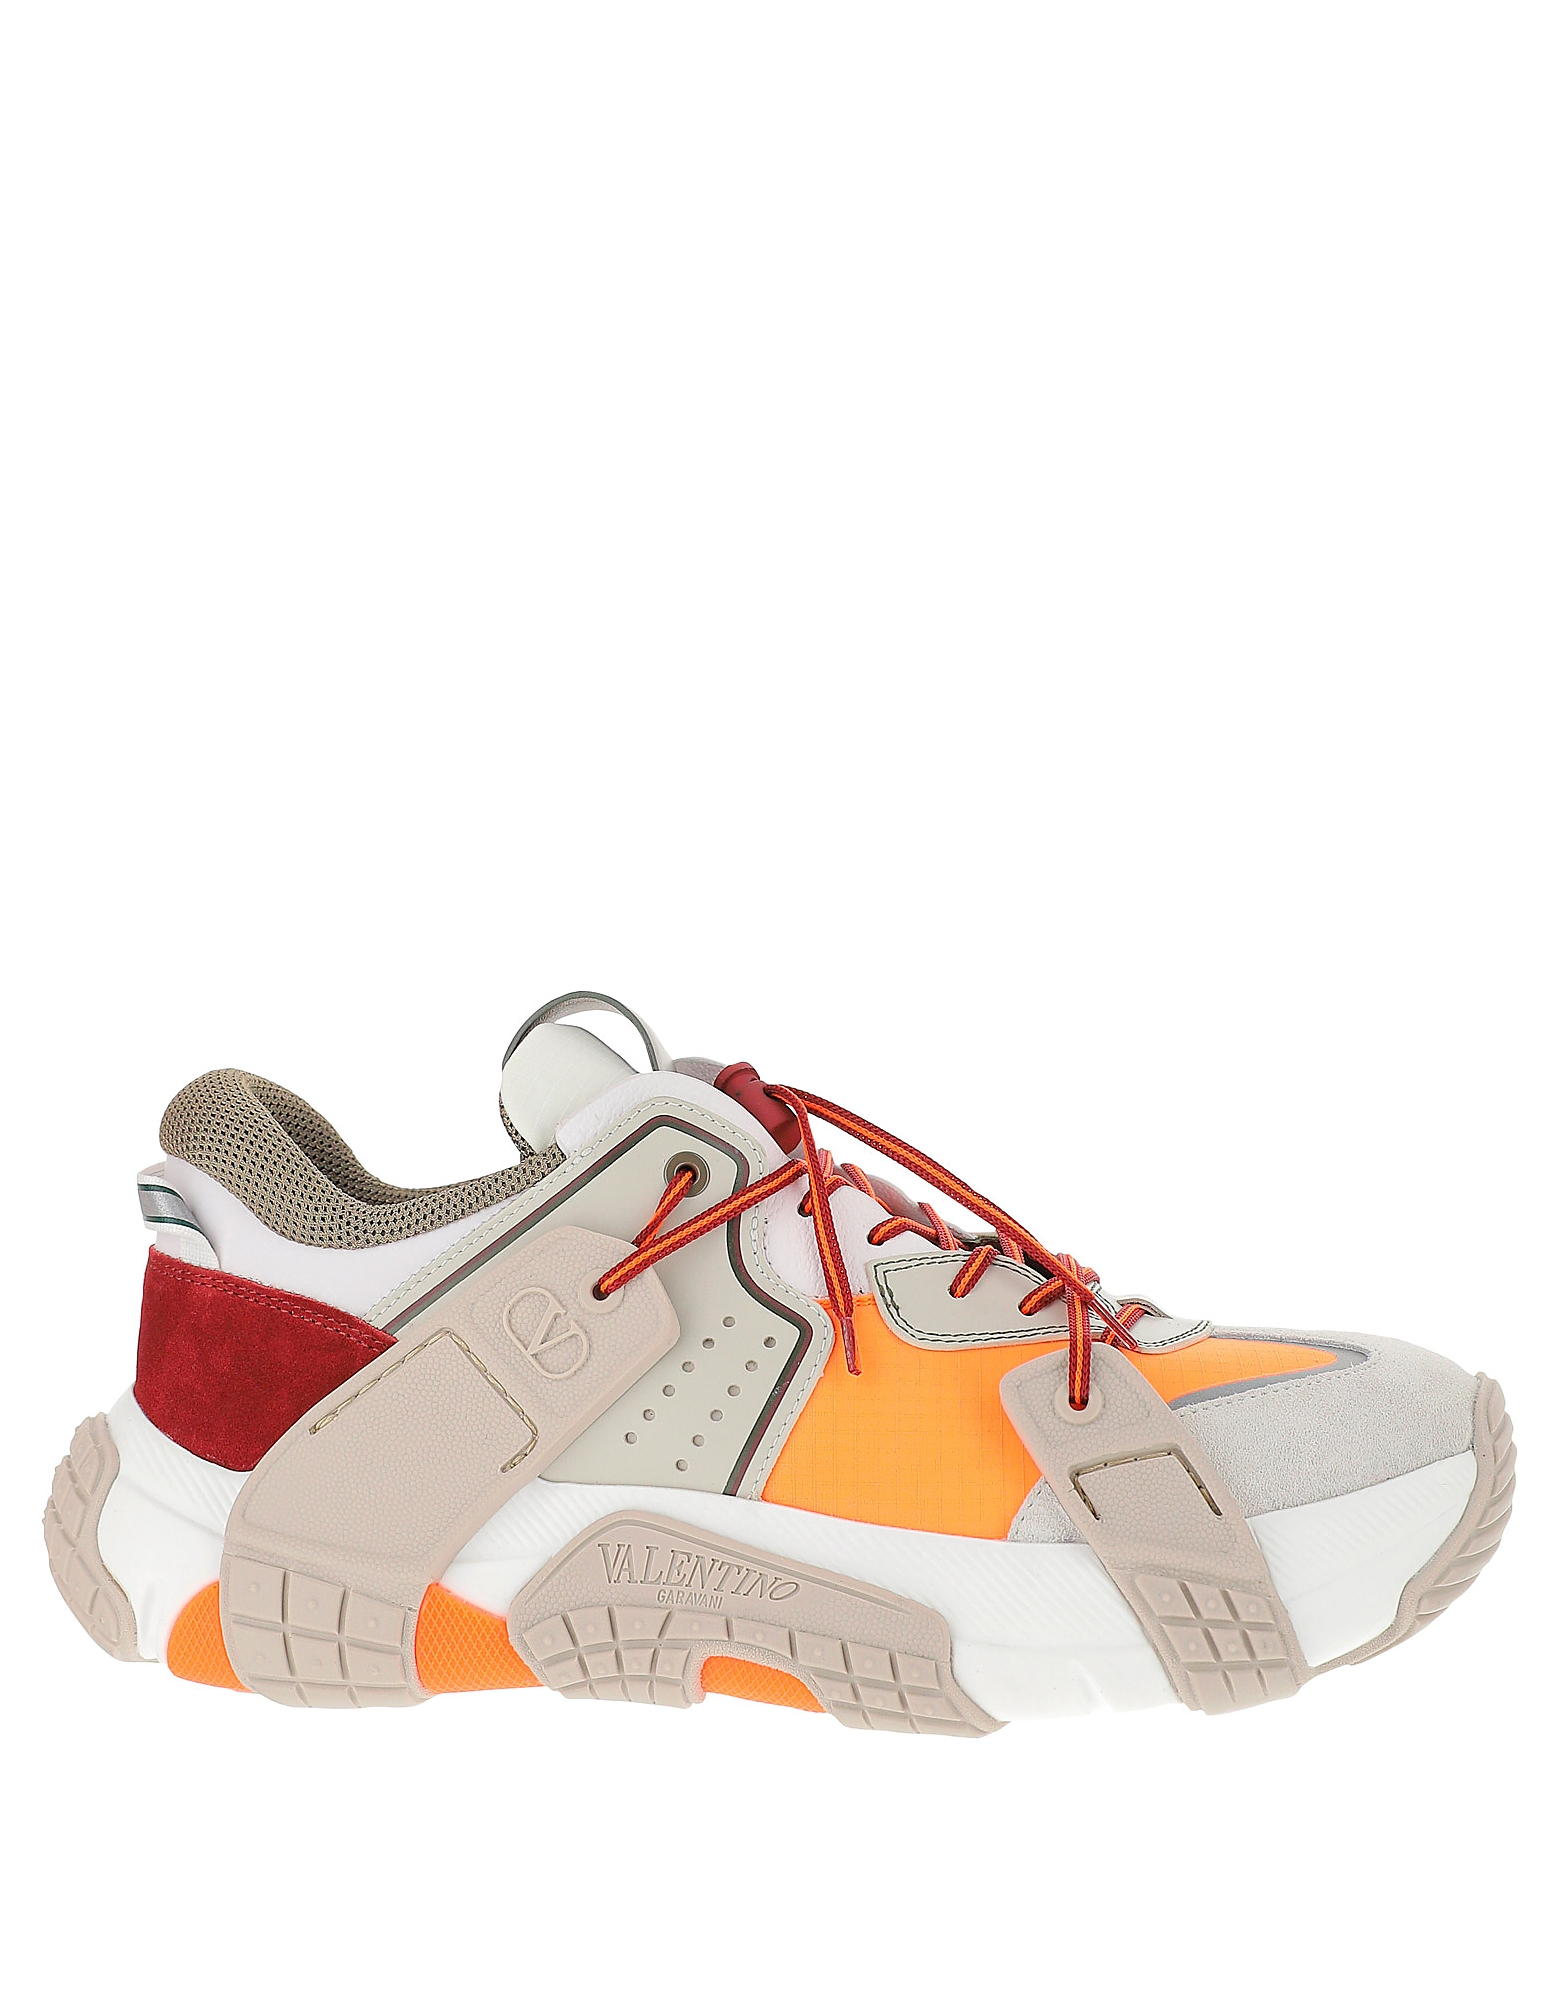 Valentino Designer Shoes, Color Block Low Top VLTN Wod Sneakers